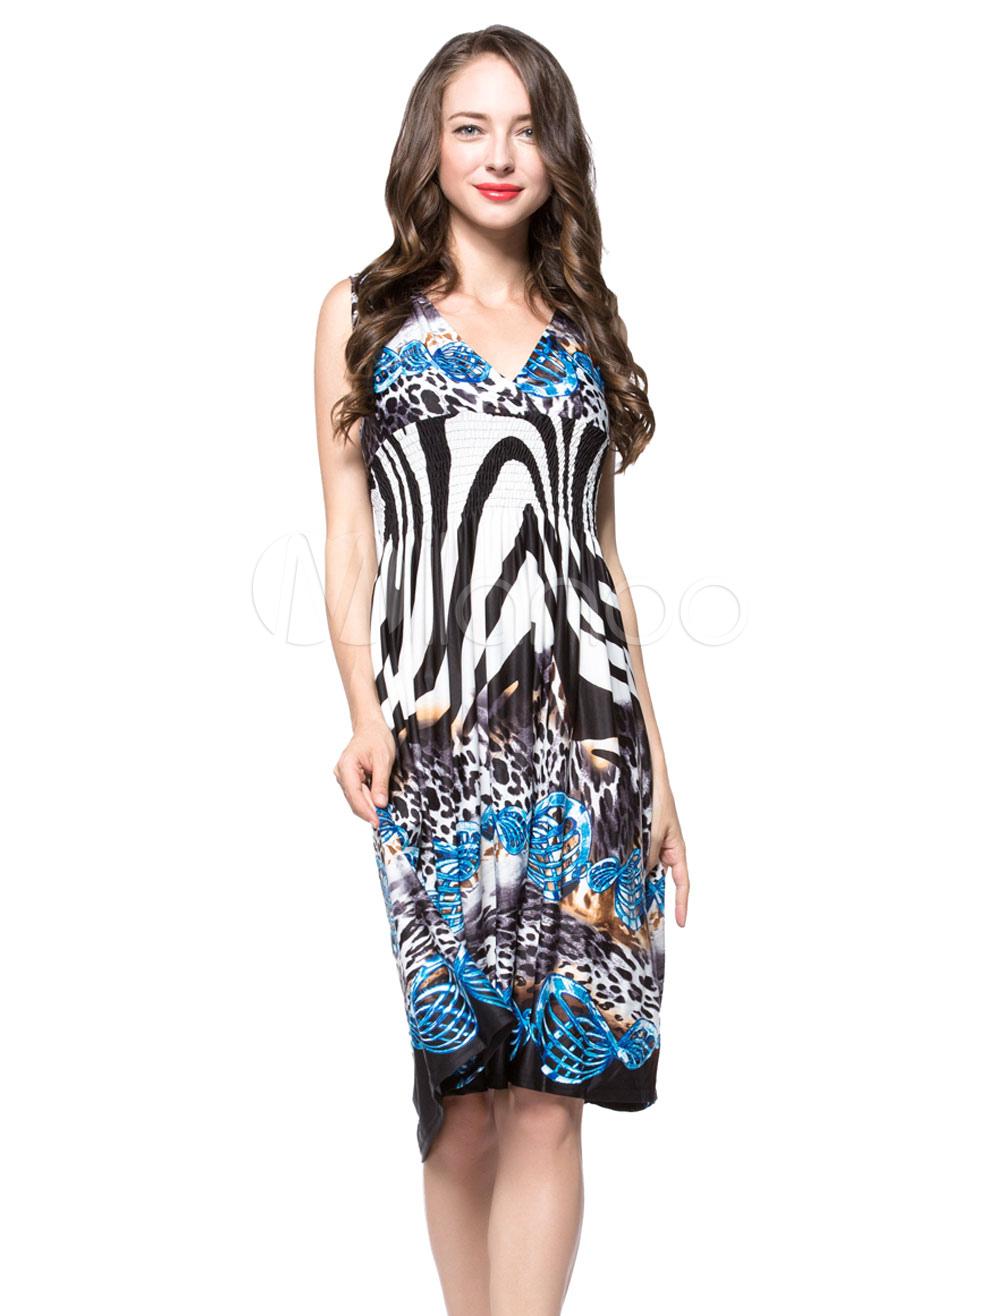 Buy Pleated Plus Size Dresss Women's Chiffon Sleeveless Leopard Print V-neck Summer Dress for $35.99 in Milanoo store